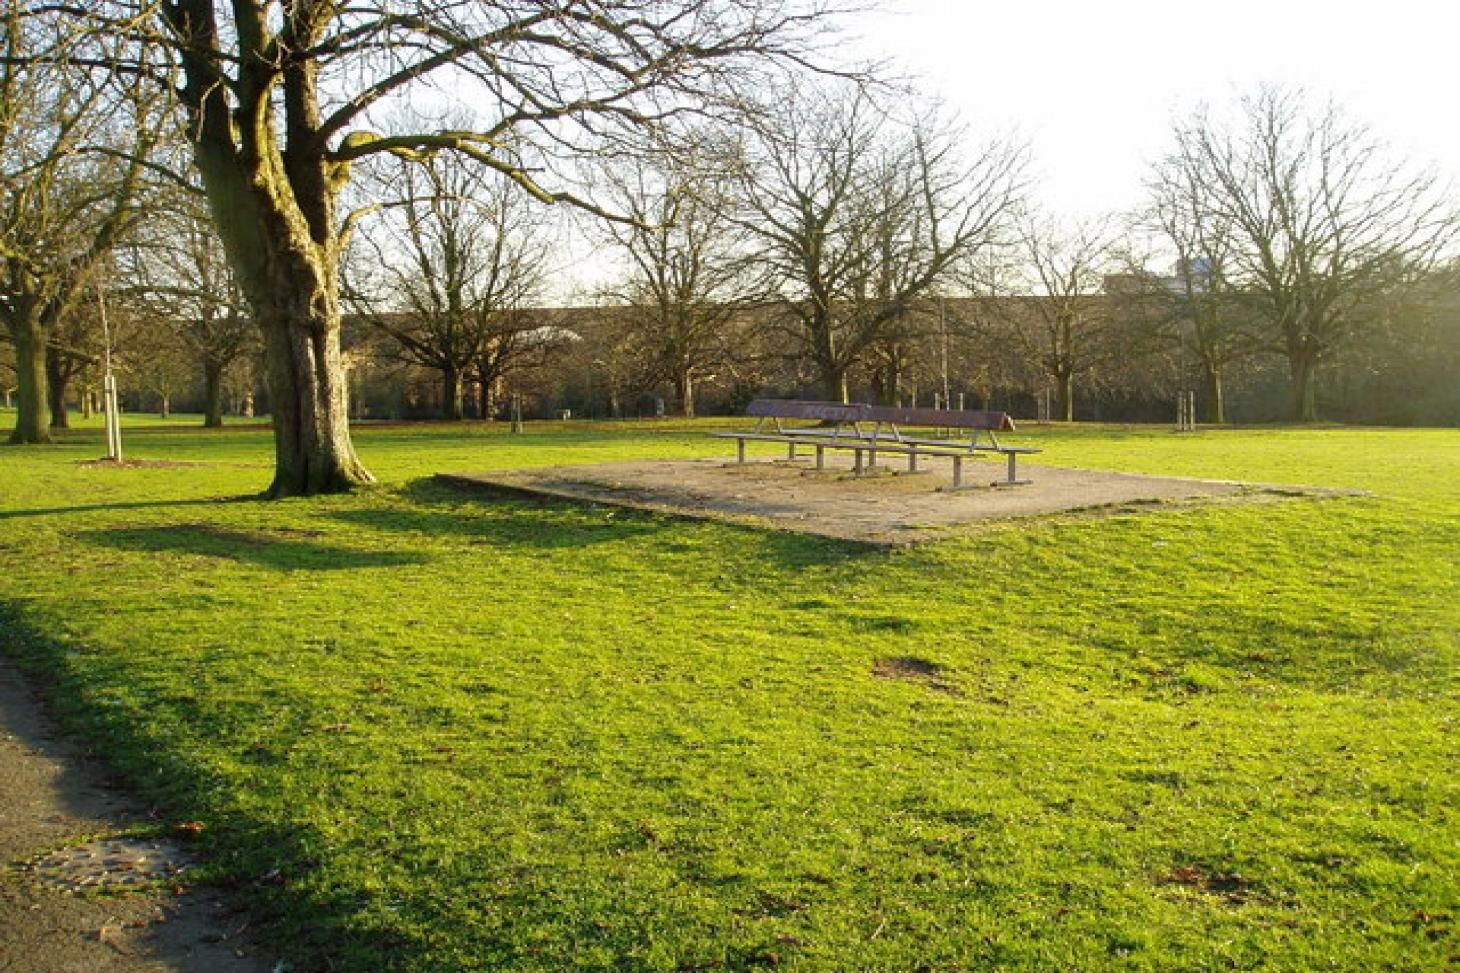 Churchfields Recreation Ground (Ealing) 5 a side | Concrete football pitch